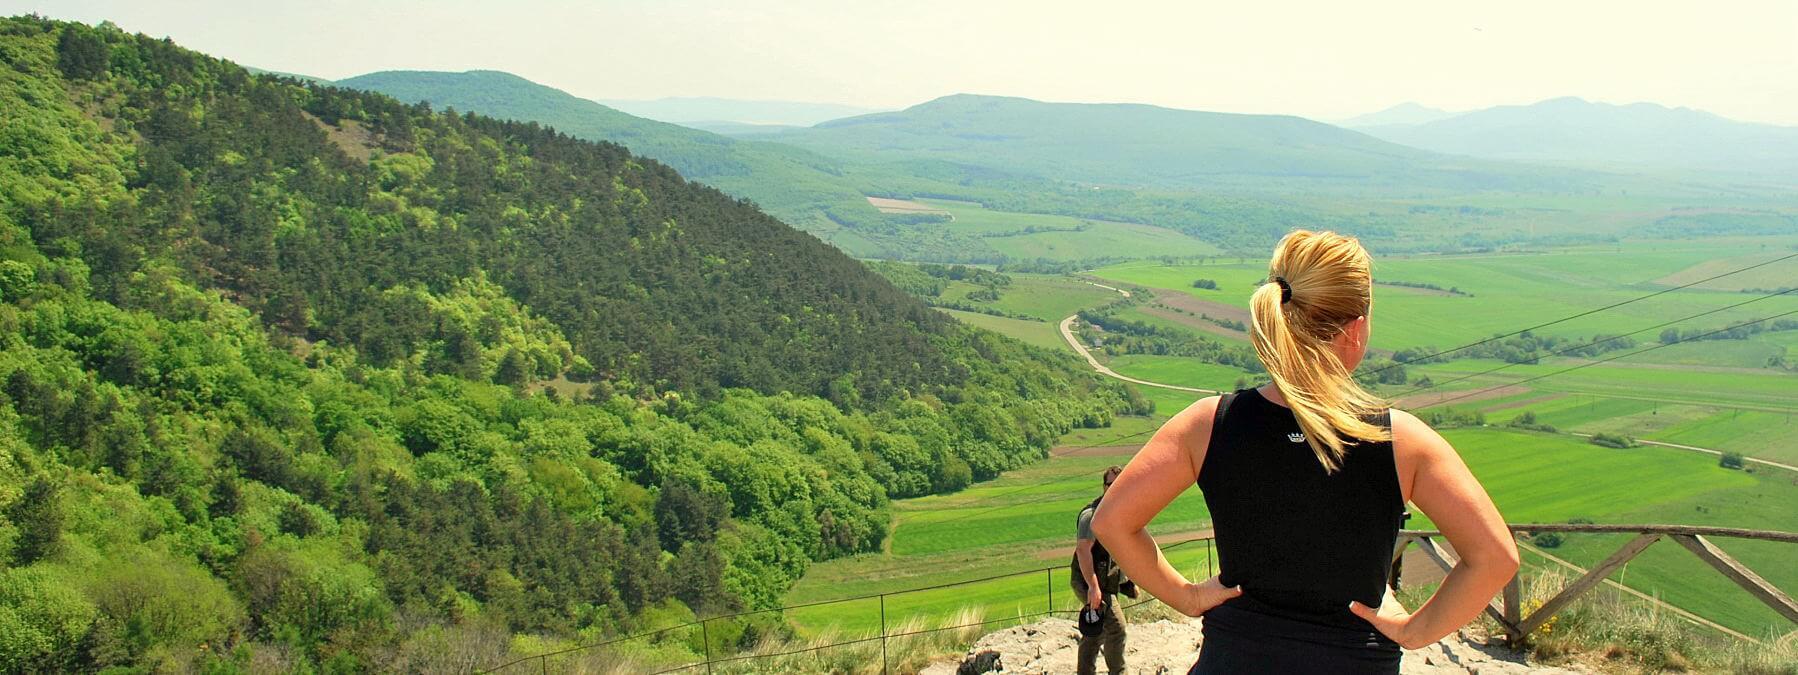 natur ungarn homepage